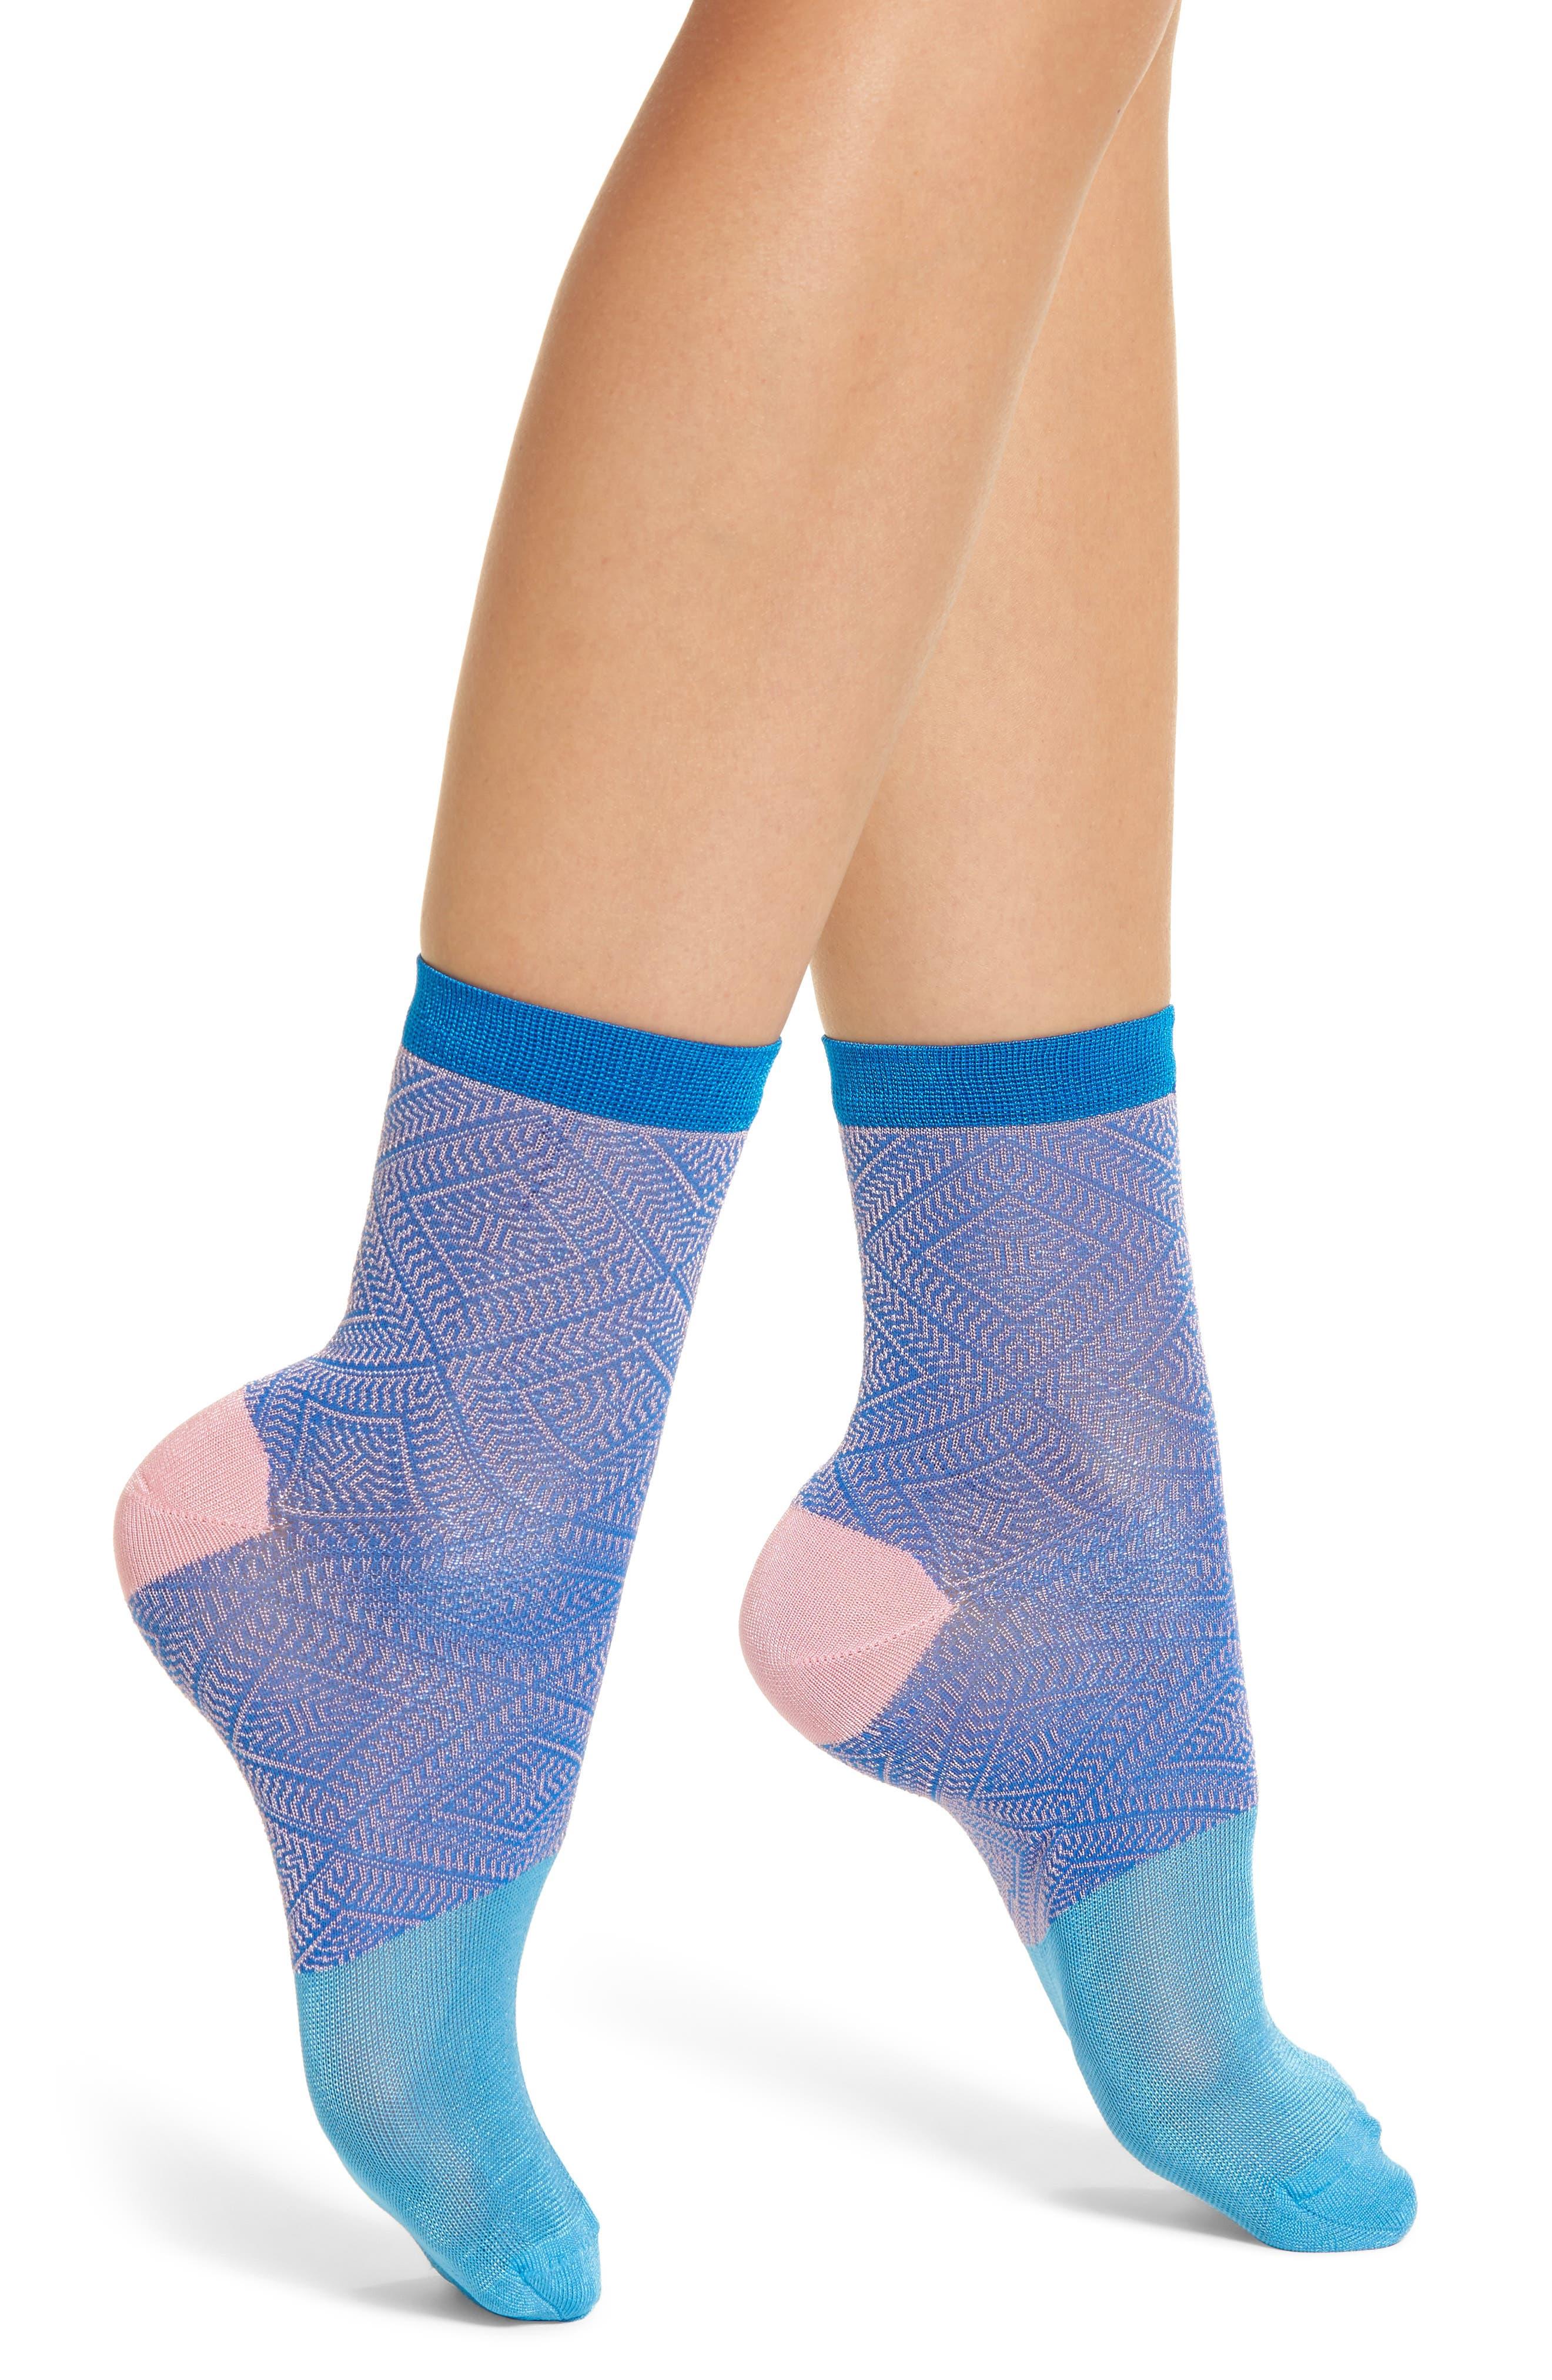 Jill Ankle Socks,                         Main,                         color, Blue